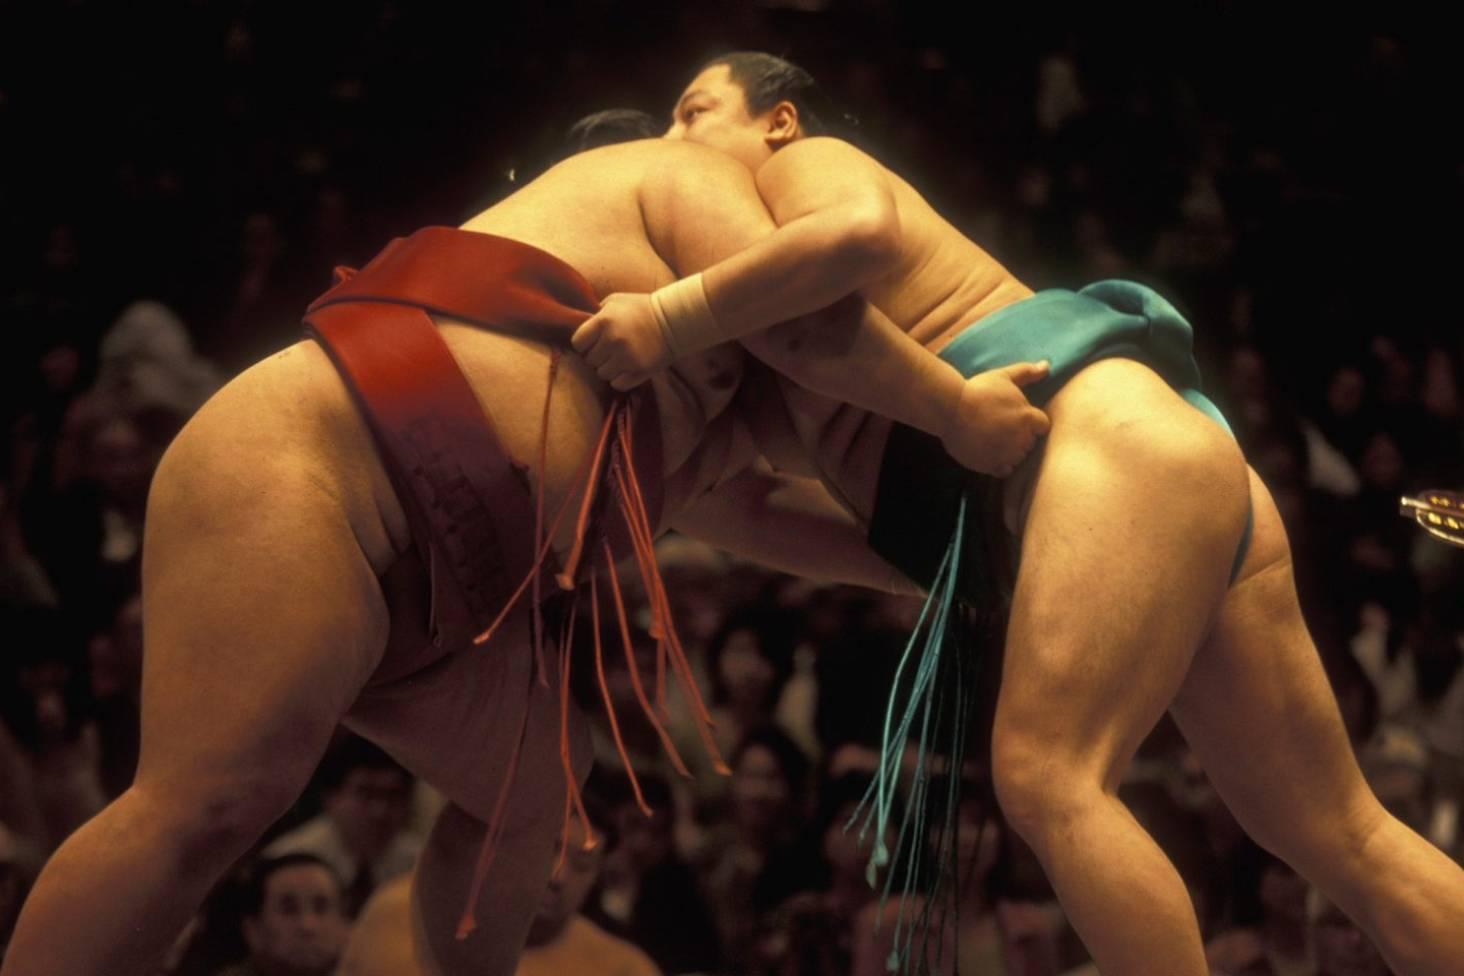 Nasty Wrestling Nude